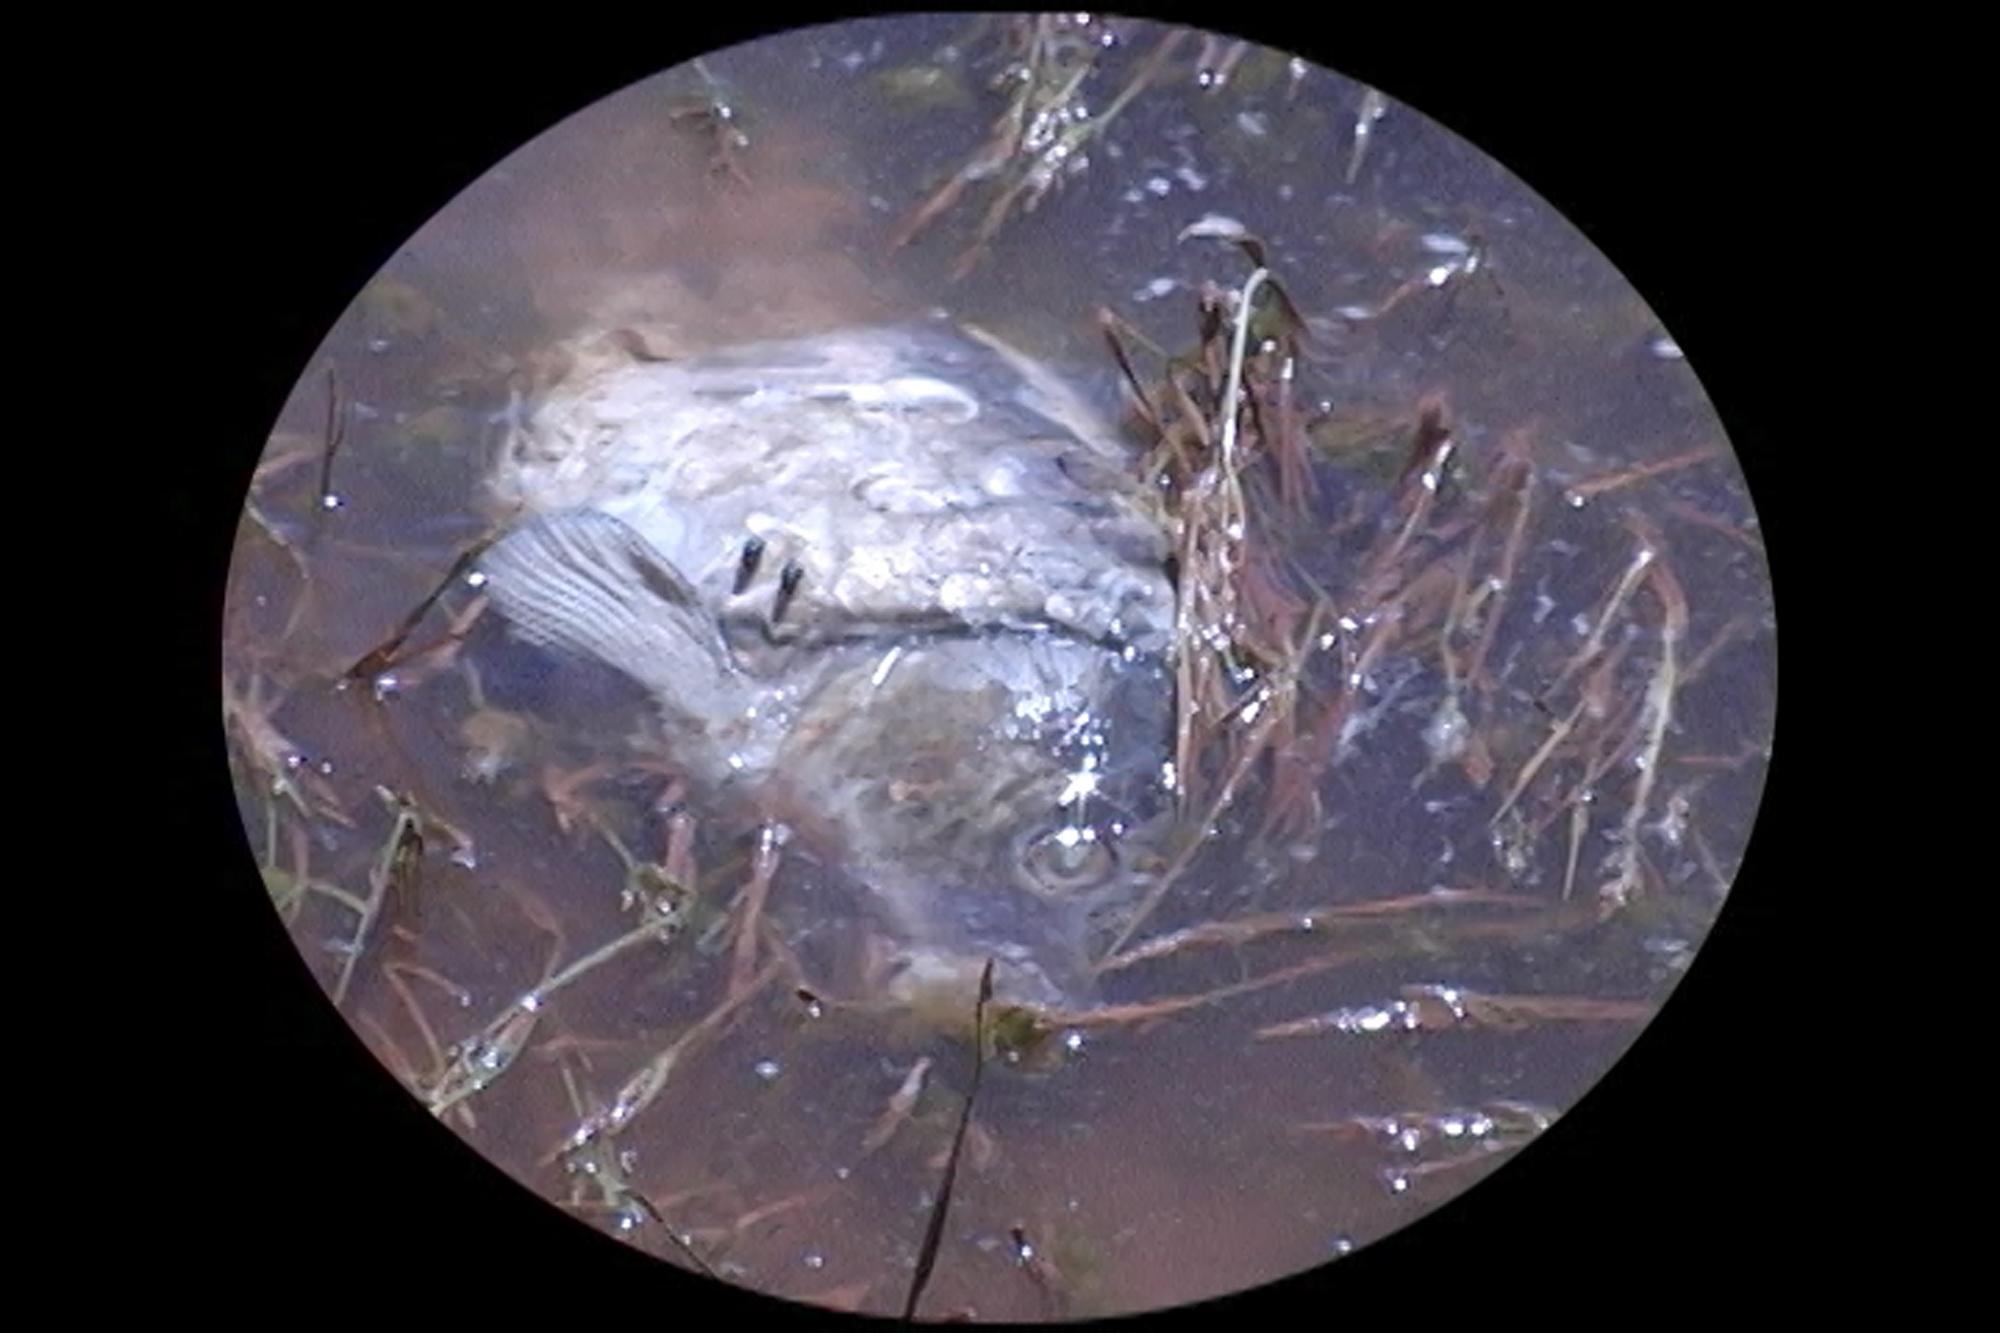 4j_Wyo-dead-fish-July-20-center-track-QT.00_12_10_28.Still012.jpg